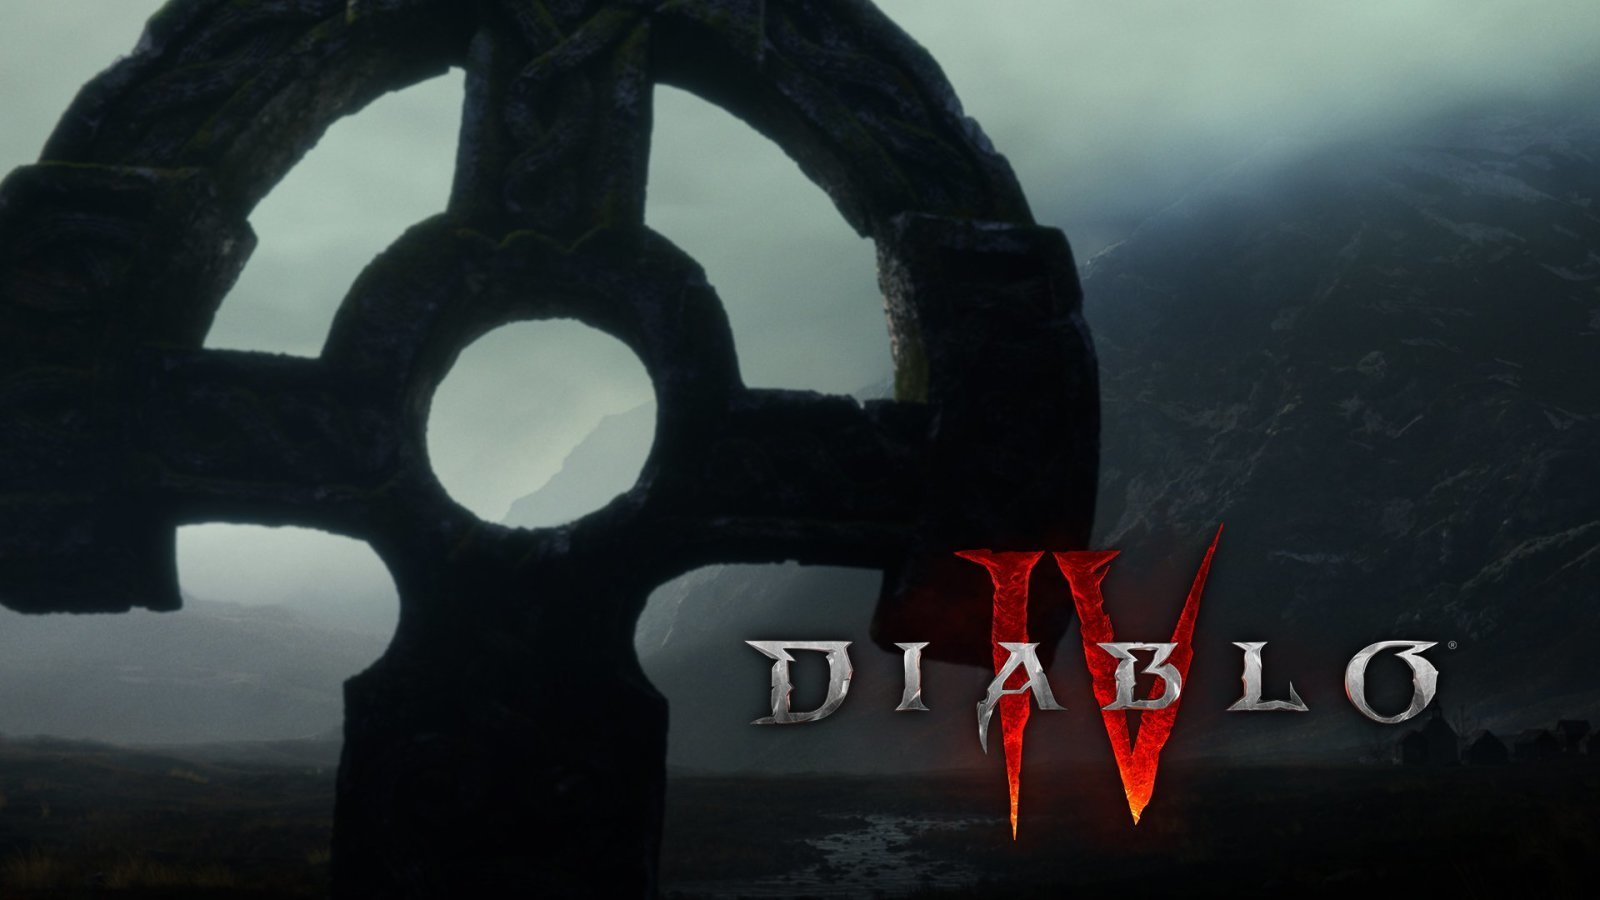 Diablo IV for PC image